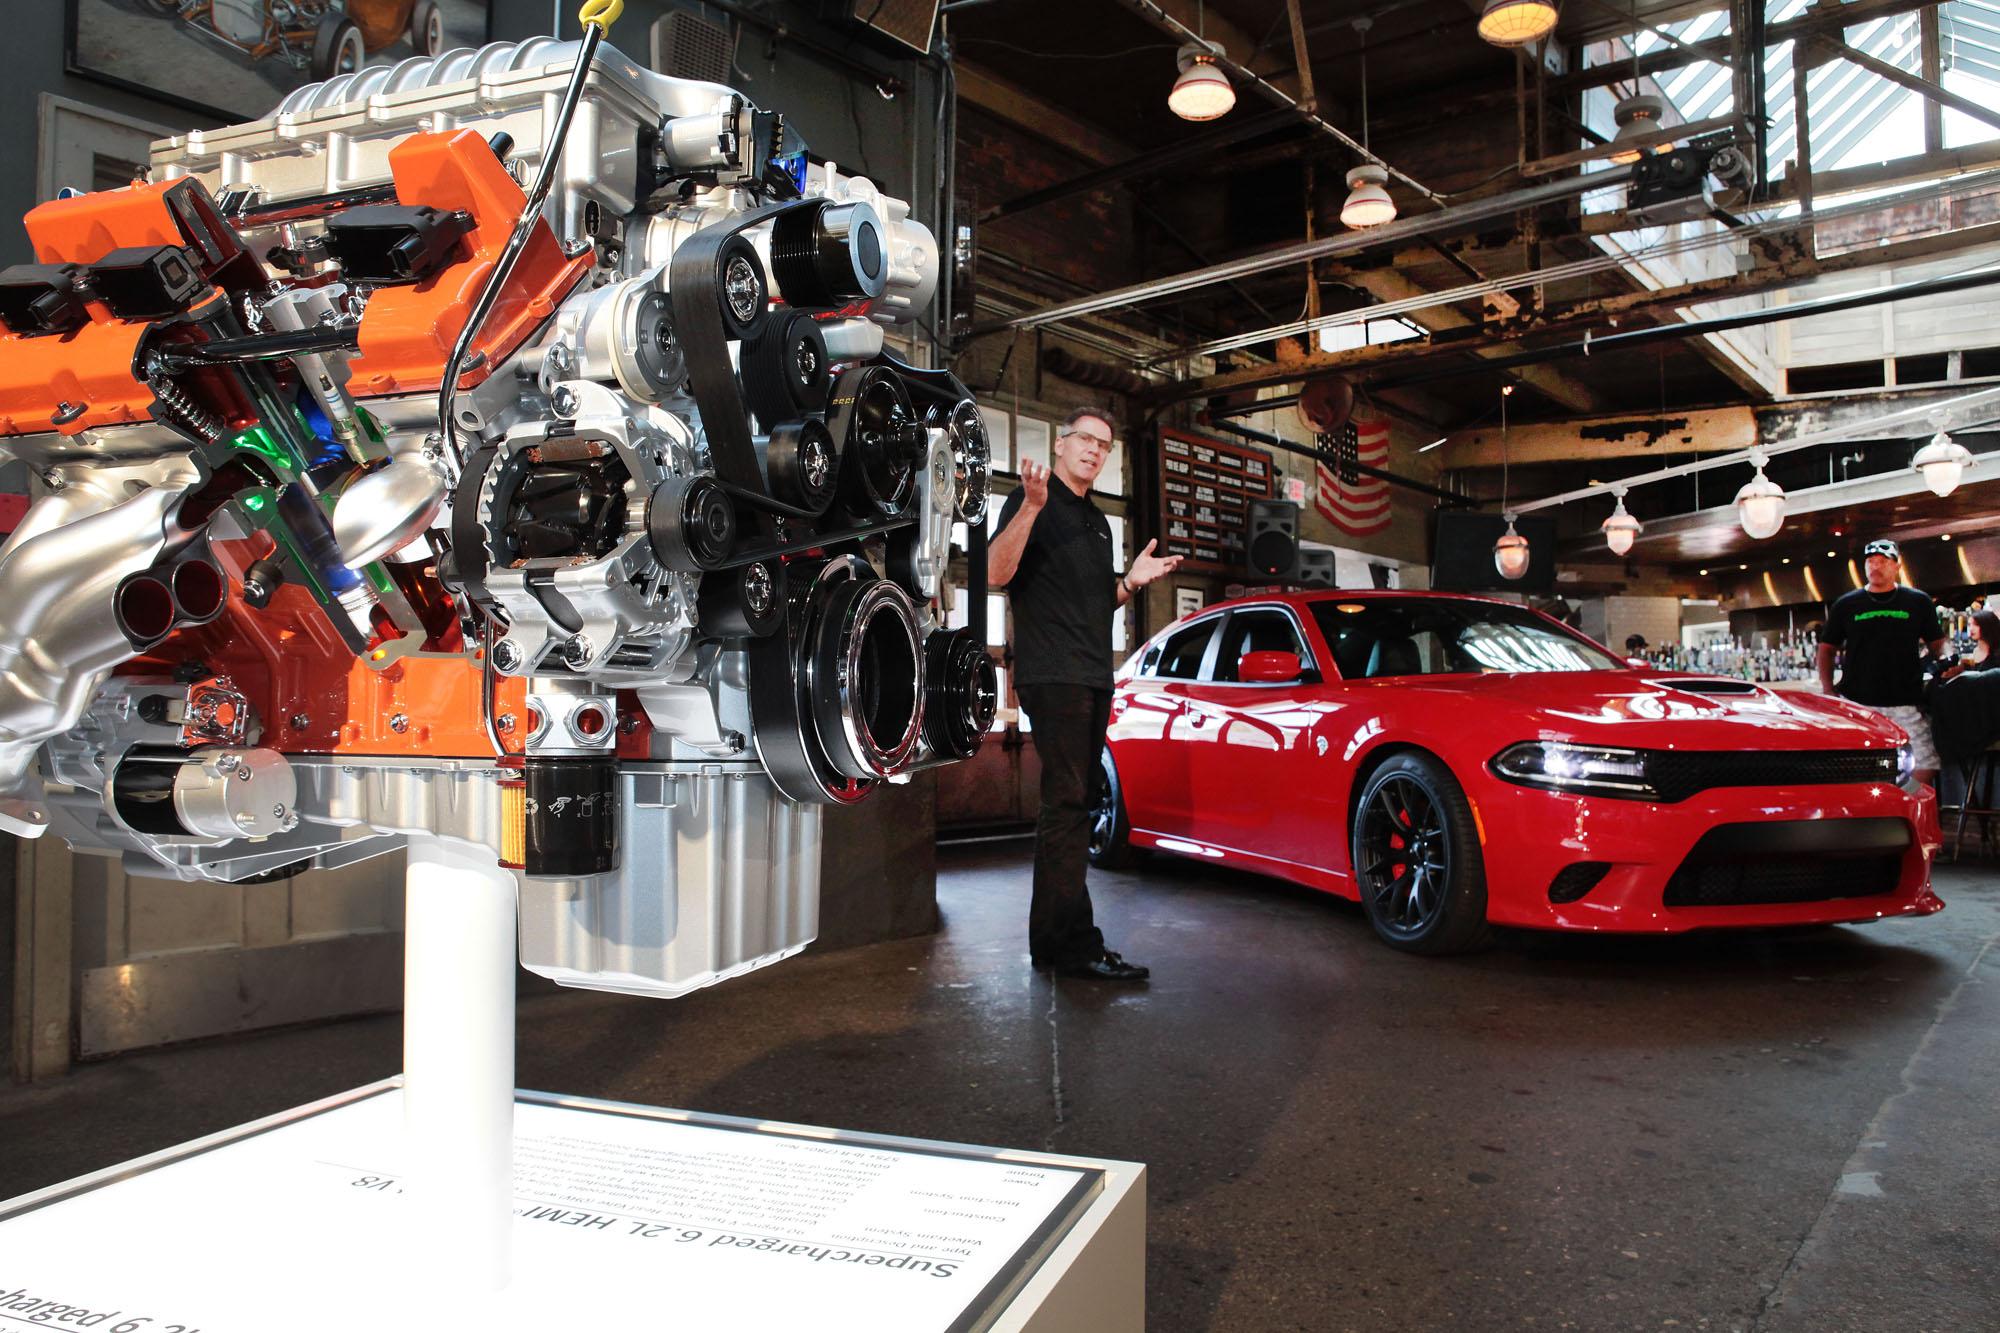 berkley mich august 13 2014 mark rudisueli head of - 2015 Dodge Challenger Srt With The Hemi Hellcat Engine